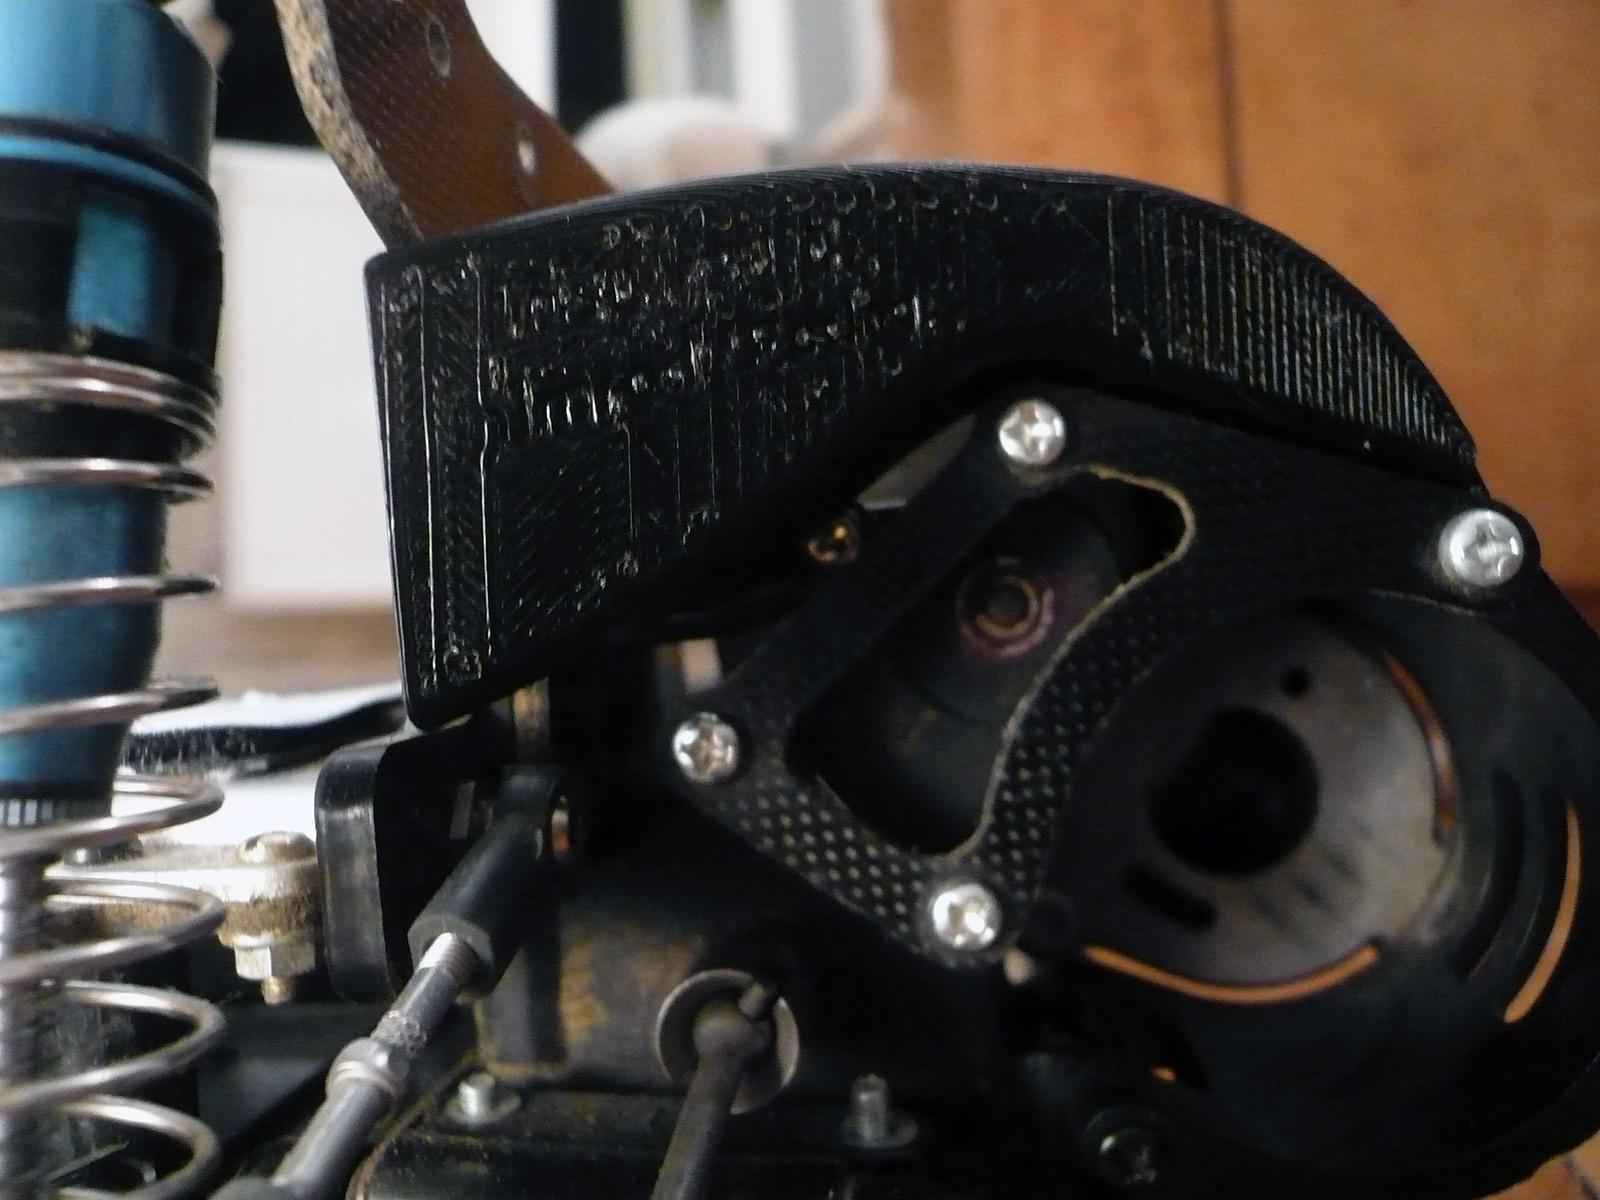 tamiya wrenchdog dyna storm nimrod racing airscoop motor cooling